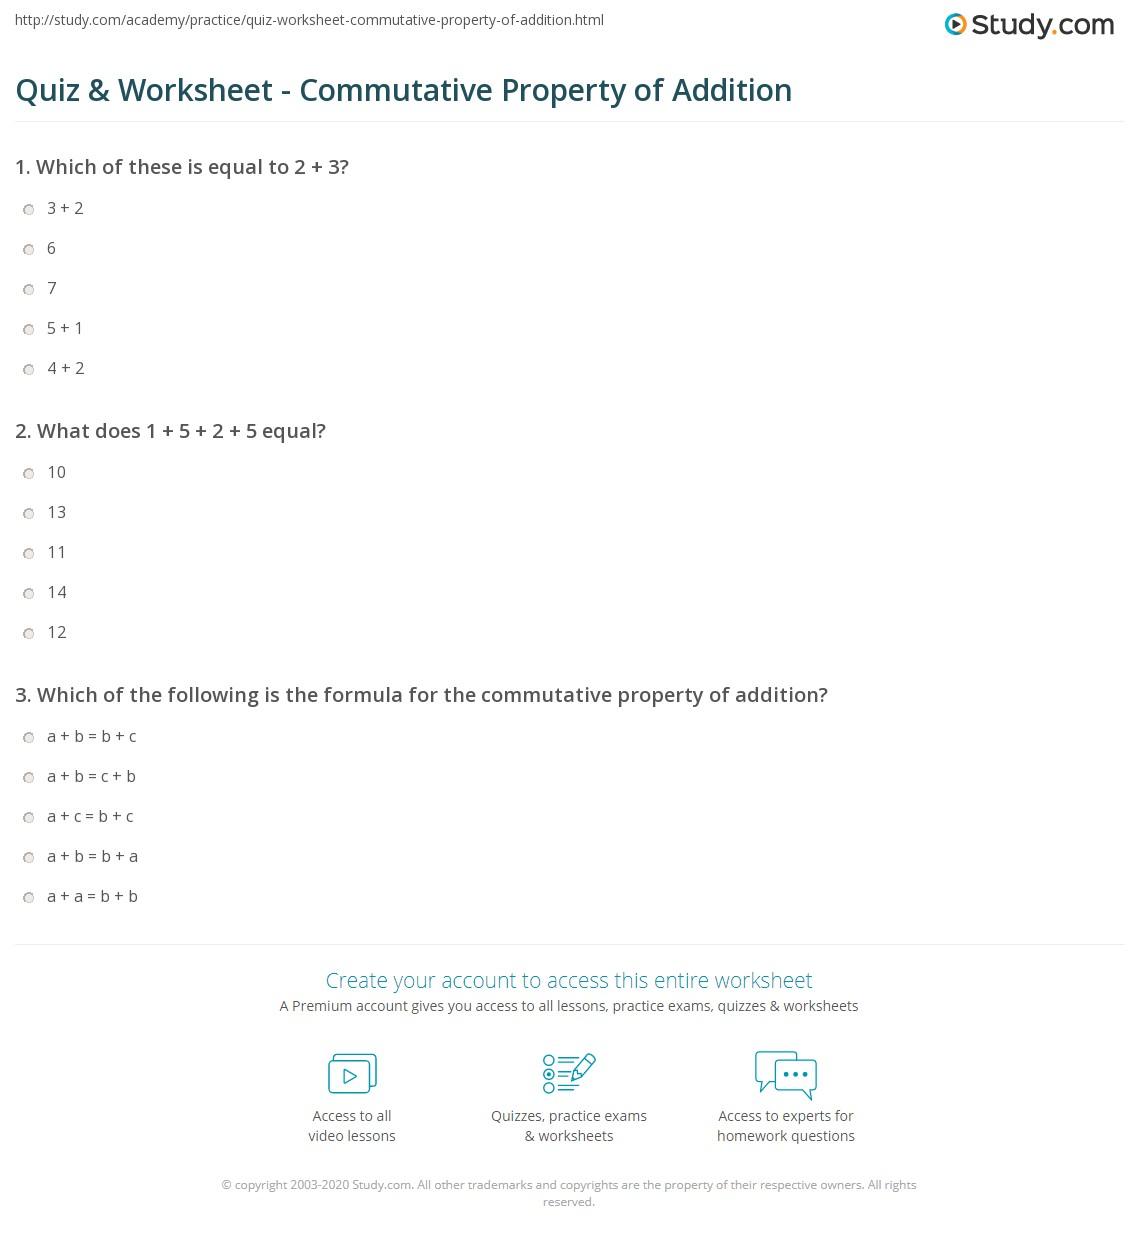 Commutative Property Of Addition Worksheets